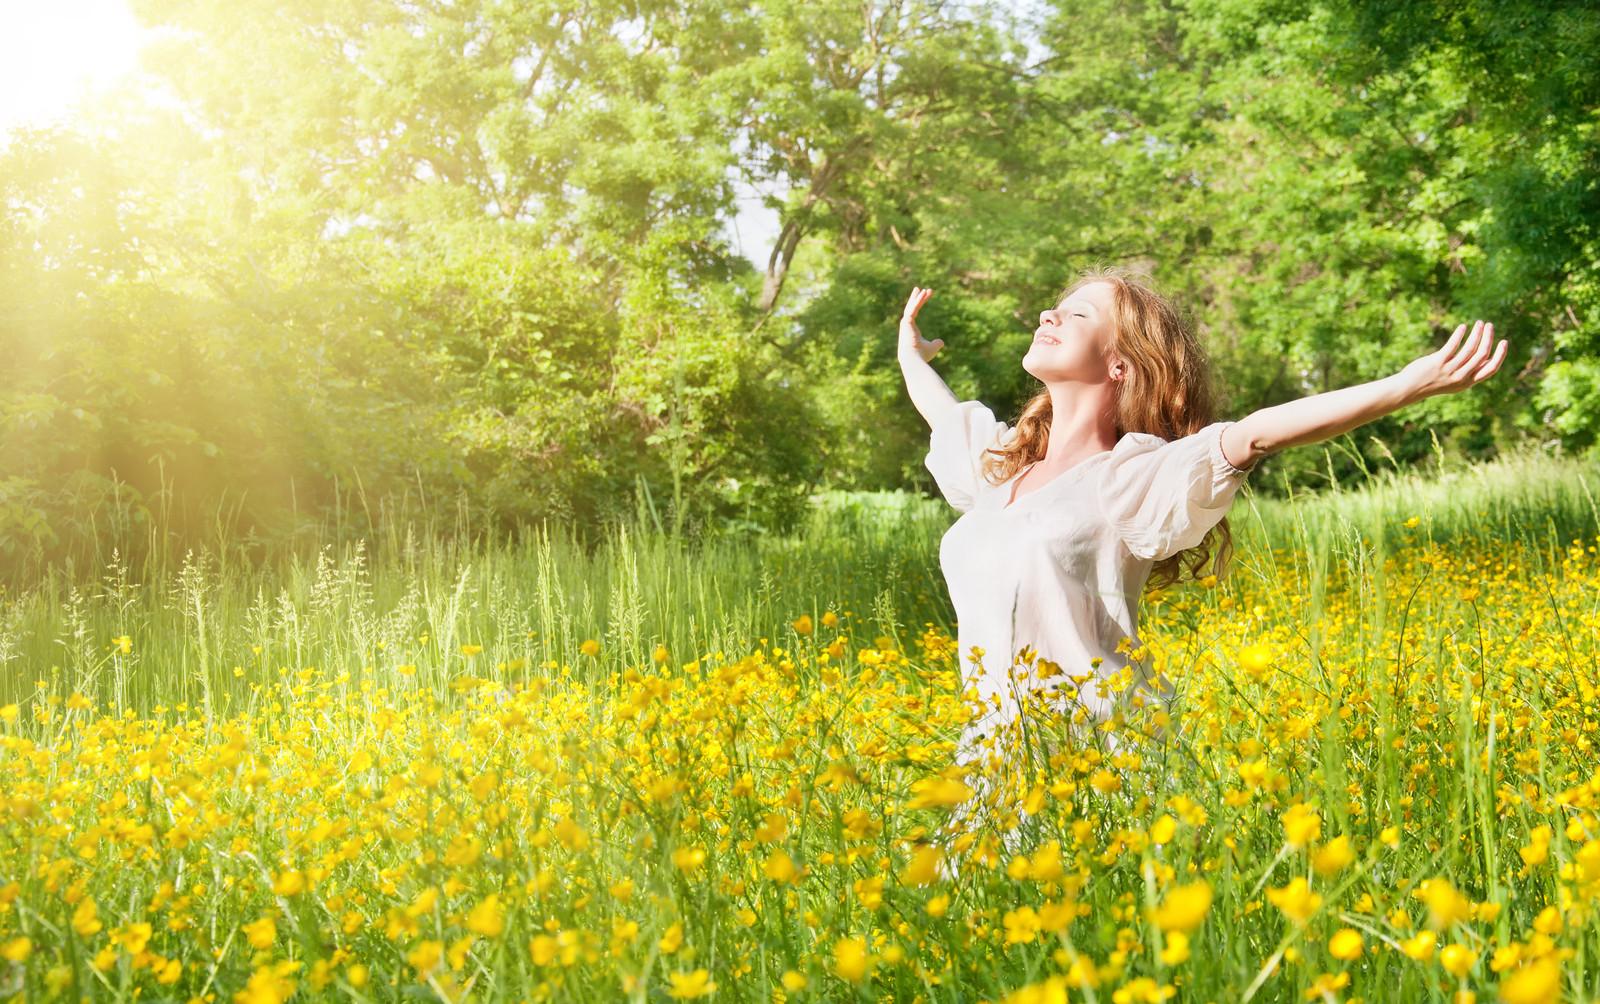 Embrace the sun, Embrace Vitamin D